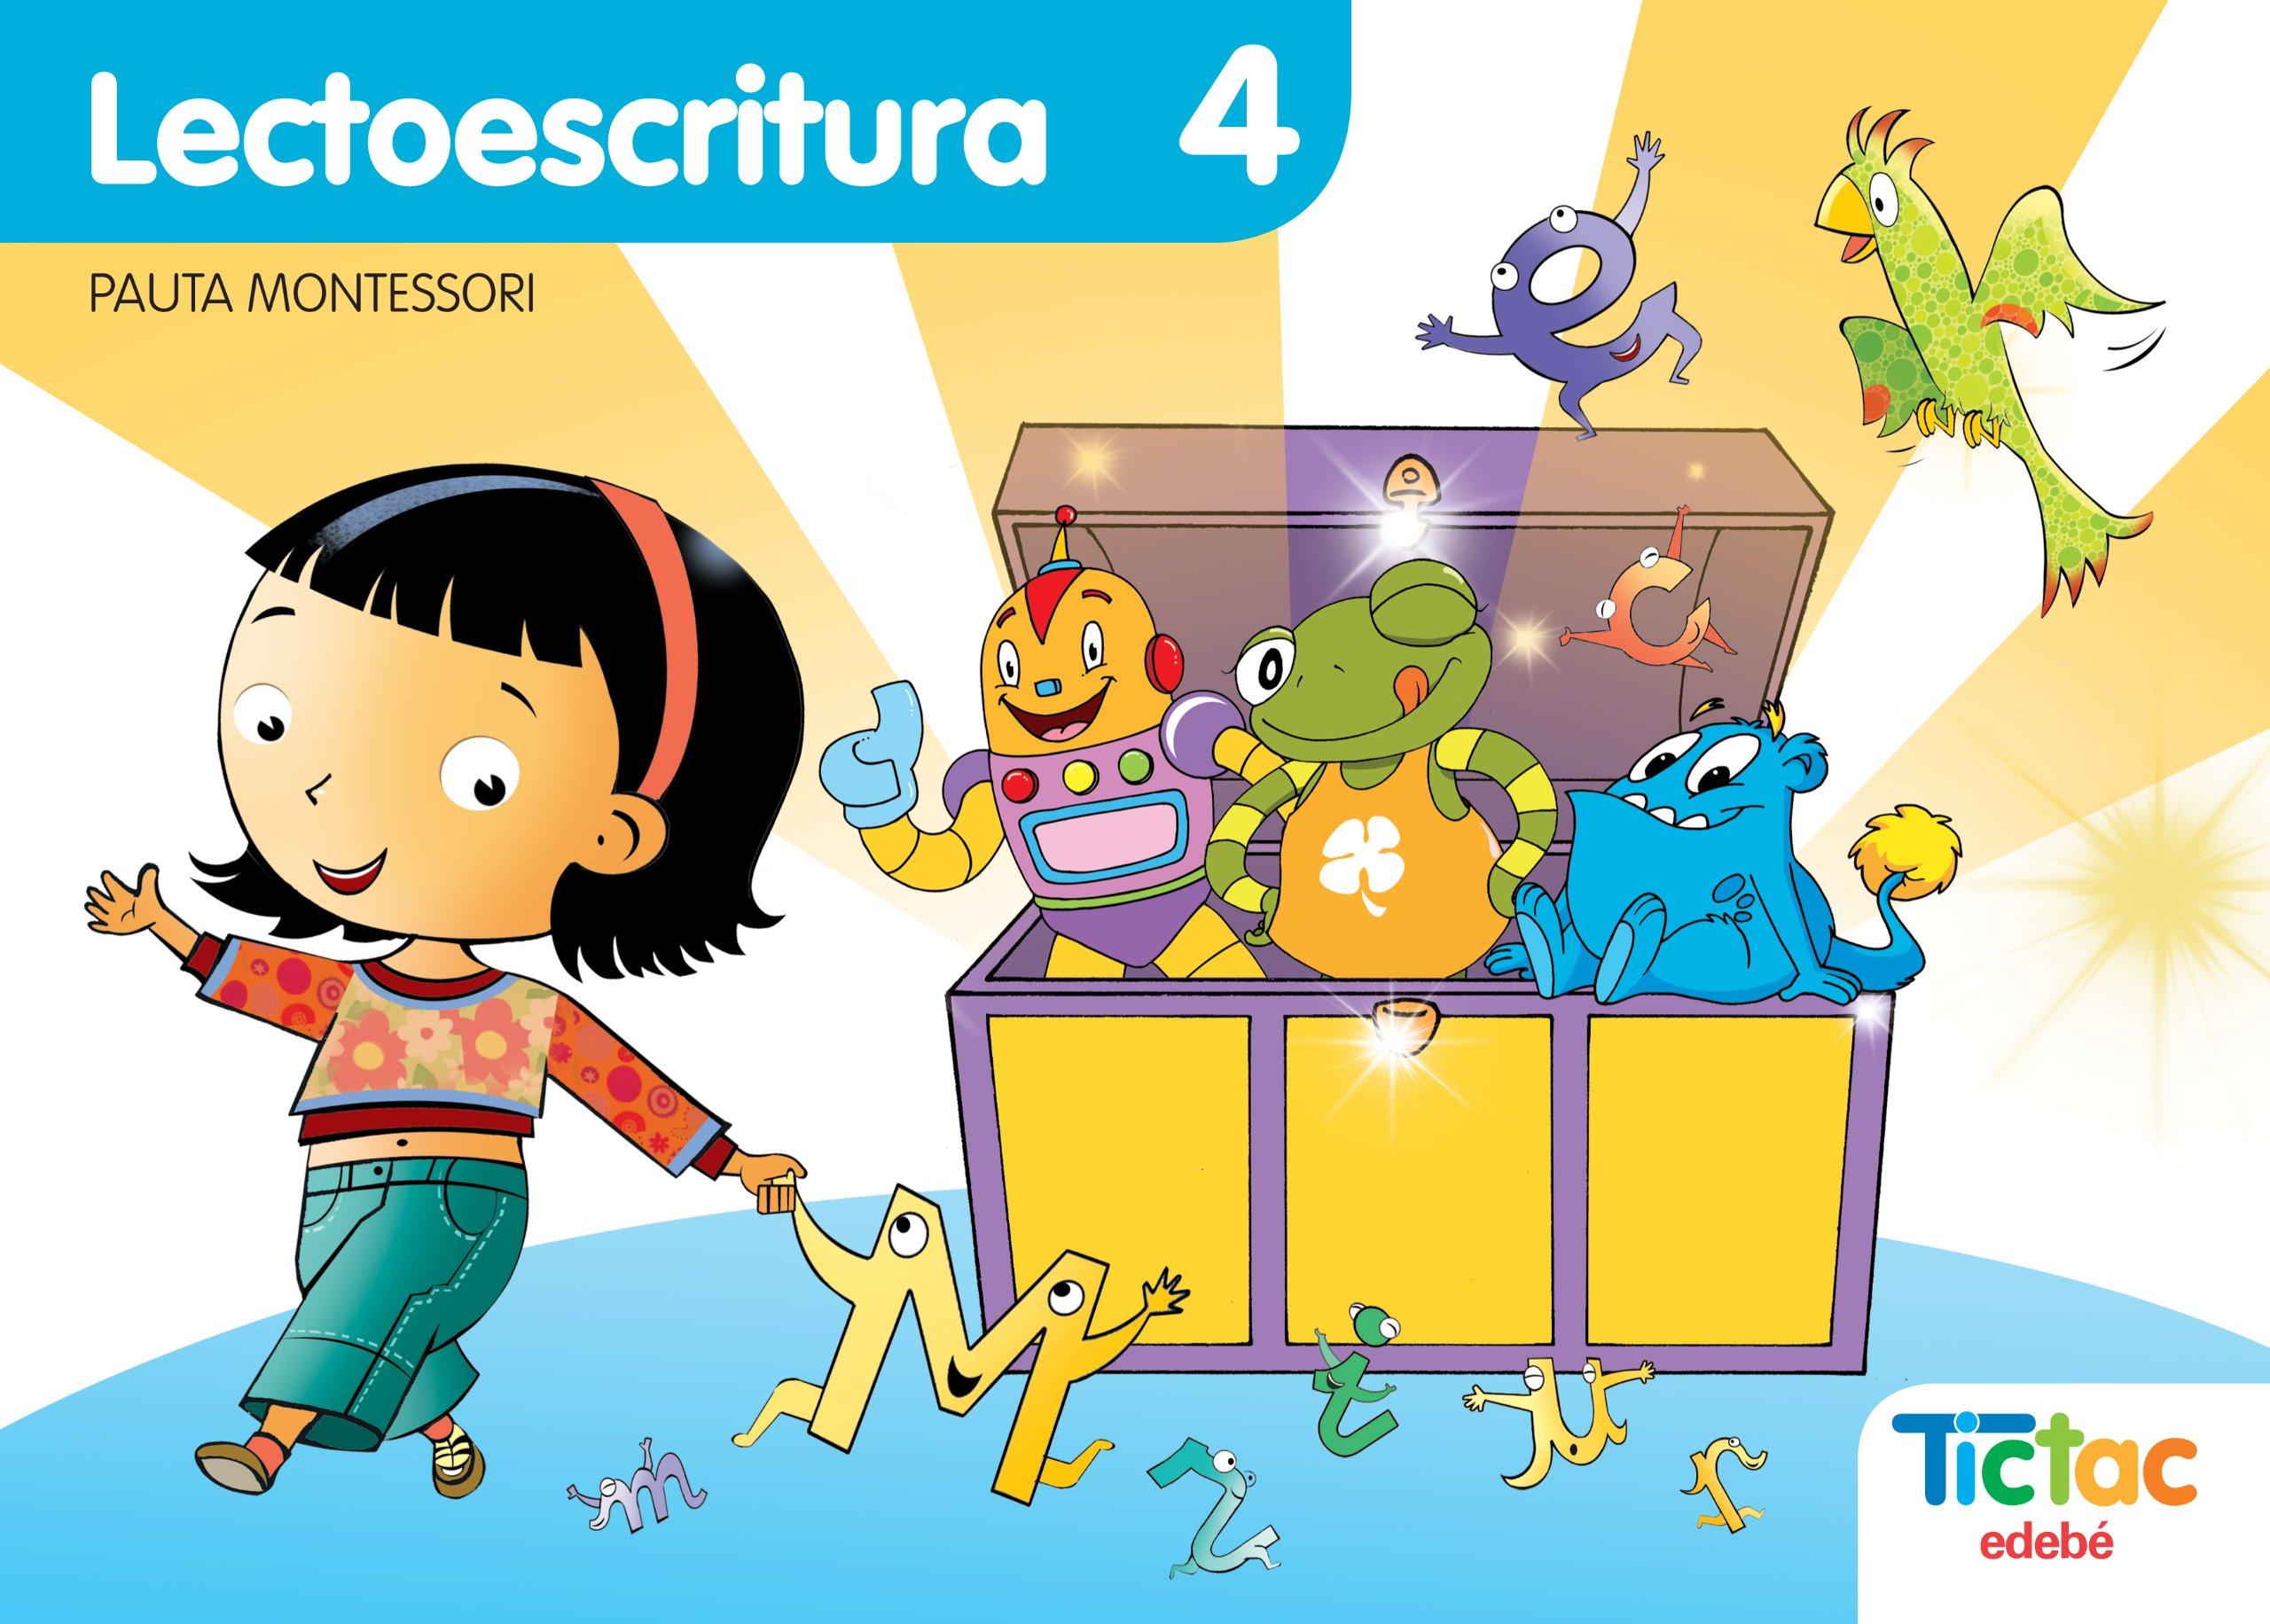 Lectoescritura 4 Pauta Montessori - 9788423696611: Amazon.es: Obra  Colectiva Edebé: Libros